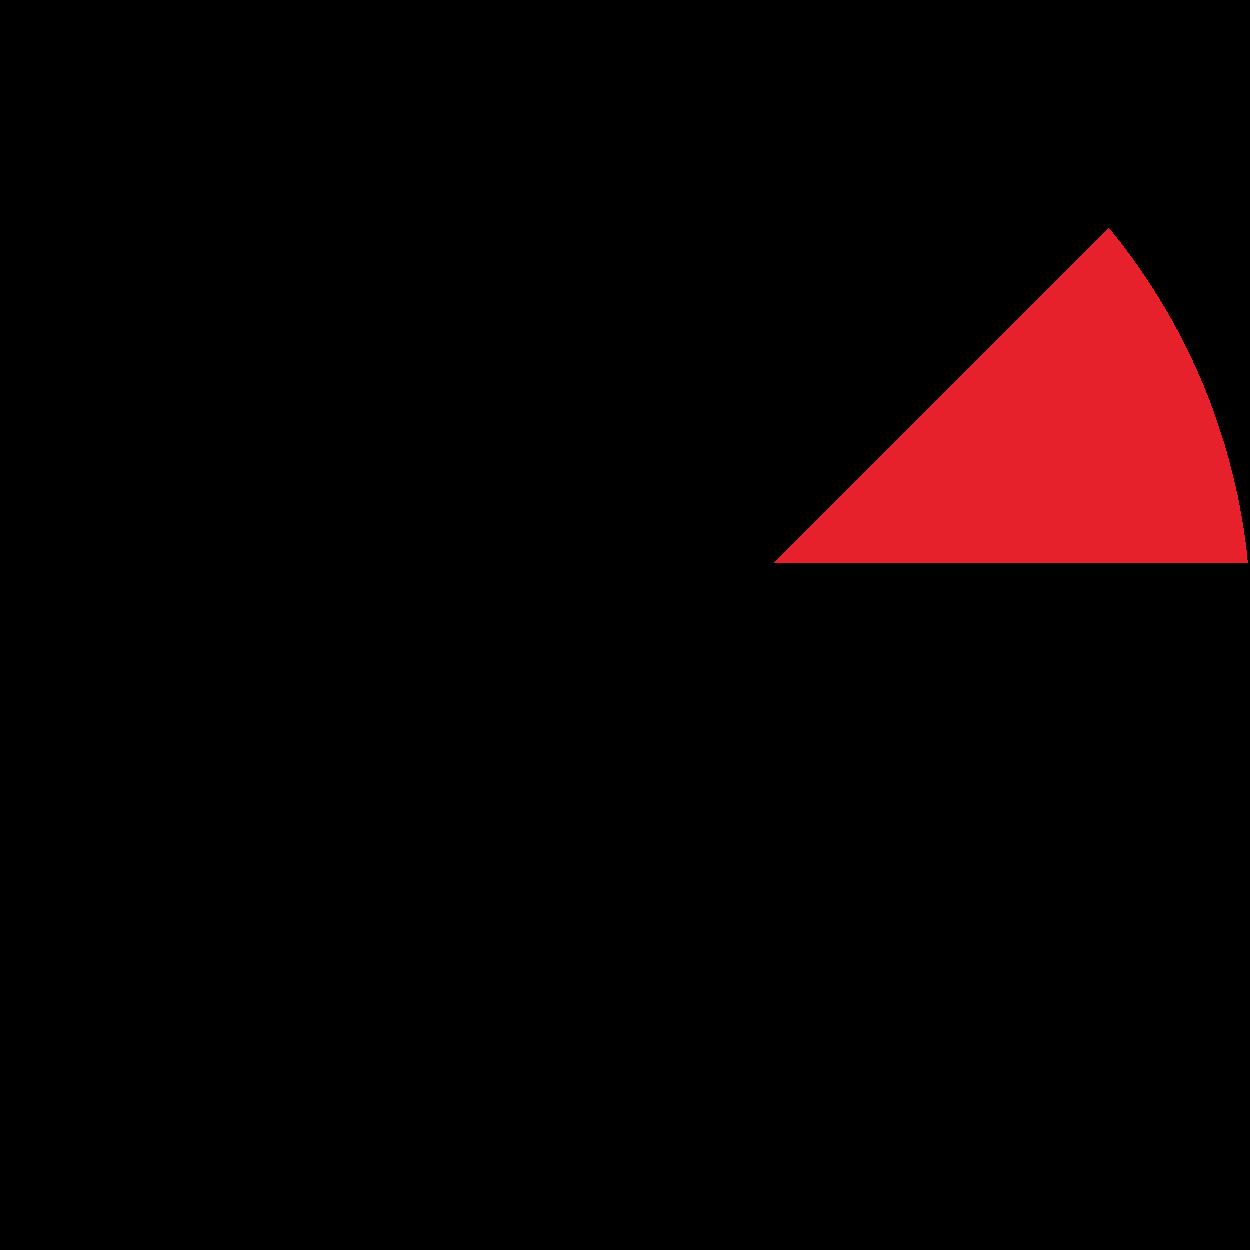 Best SEO Company 2018 - Kotton Grammer Media is Your #1 Digital Agency